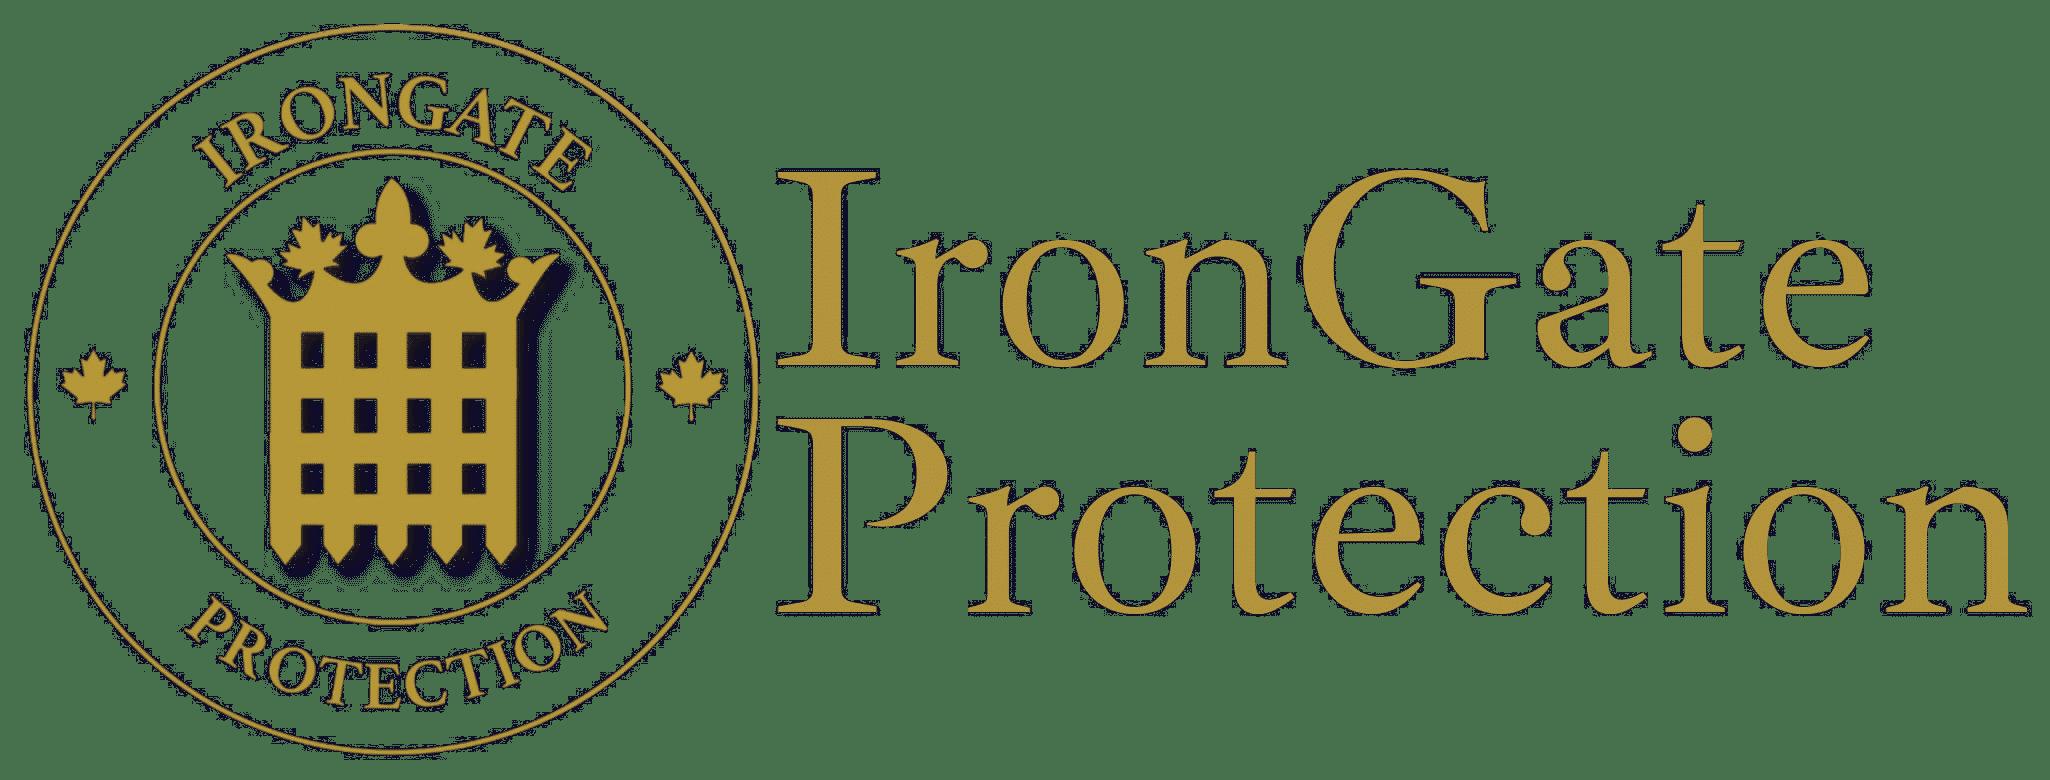 IronGate Protection